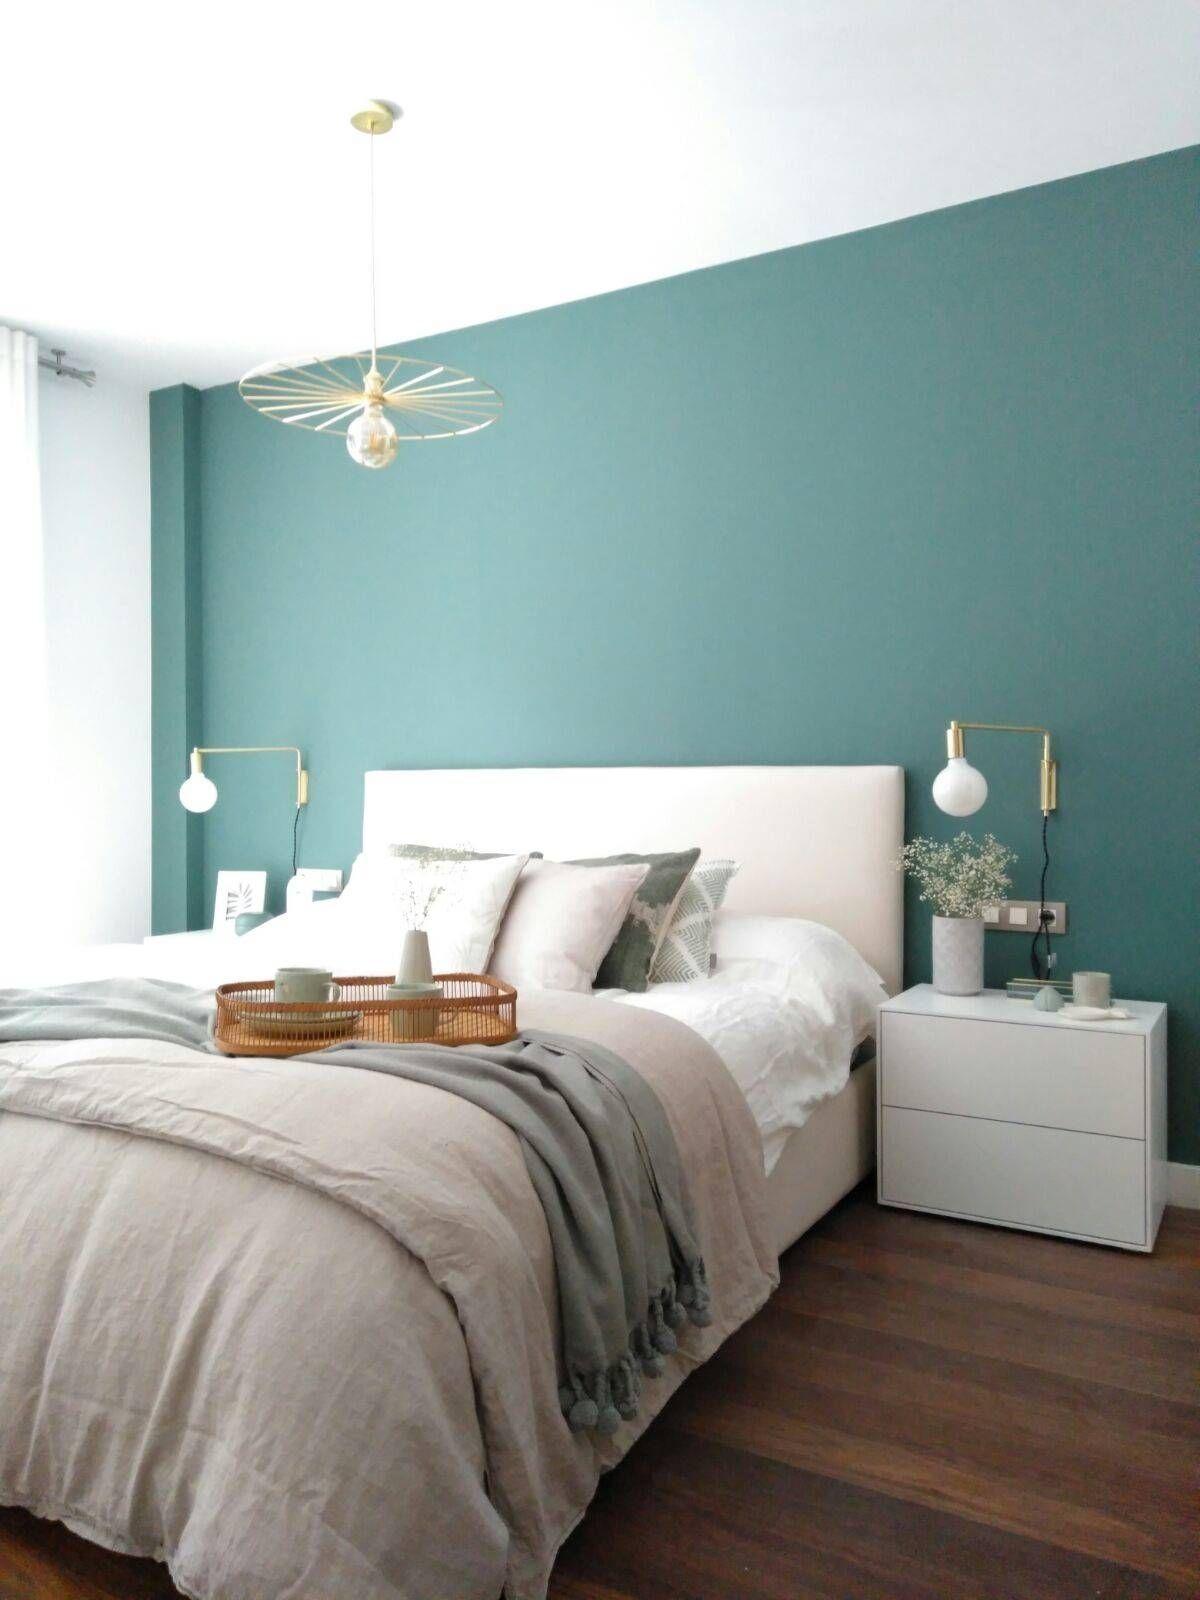 38 Amazing Color Scheme For Bedroom Design Ideas | Bedroom ... - photo#8